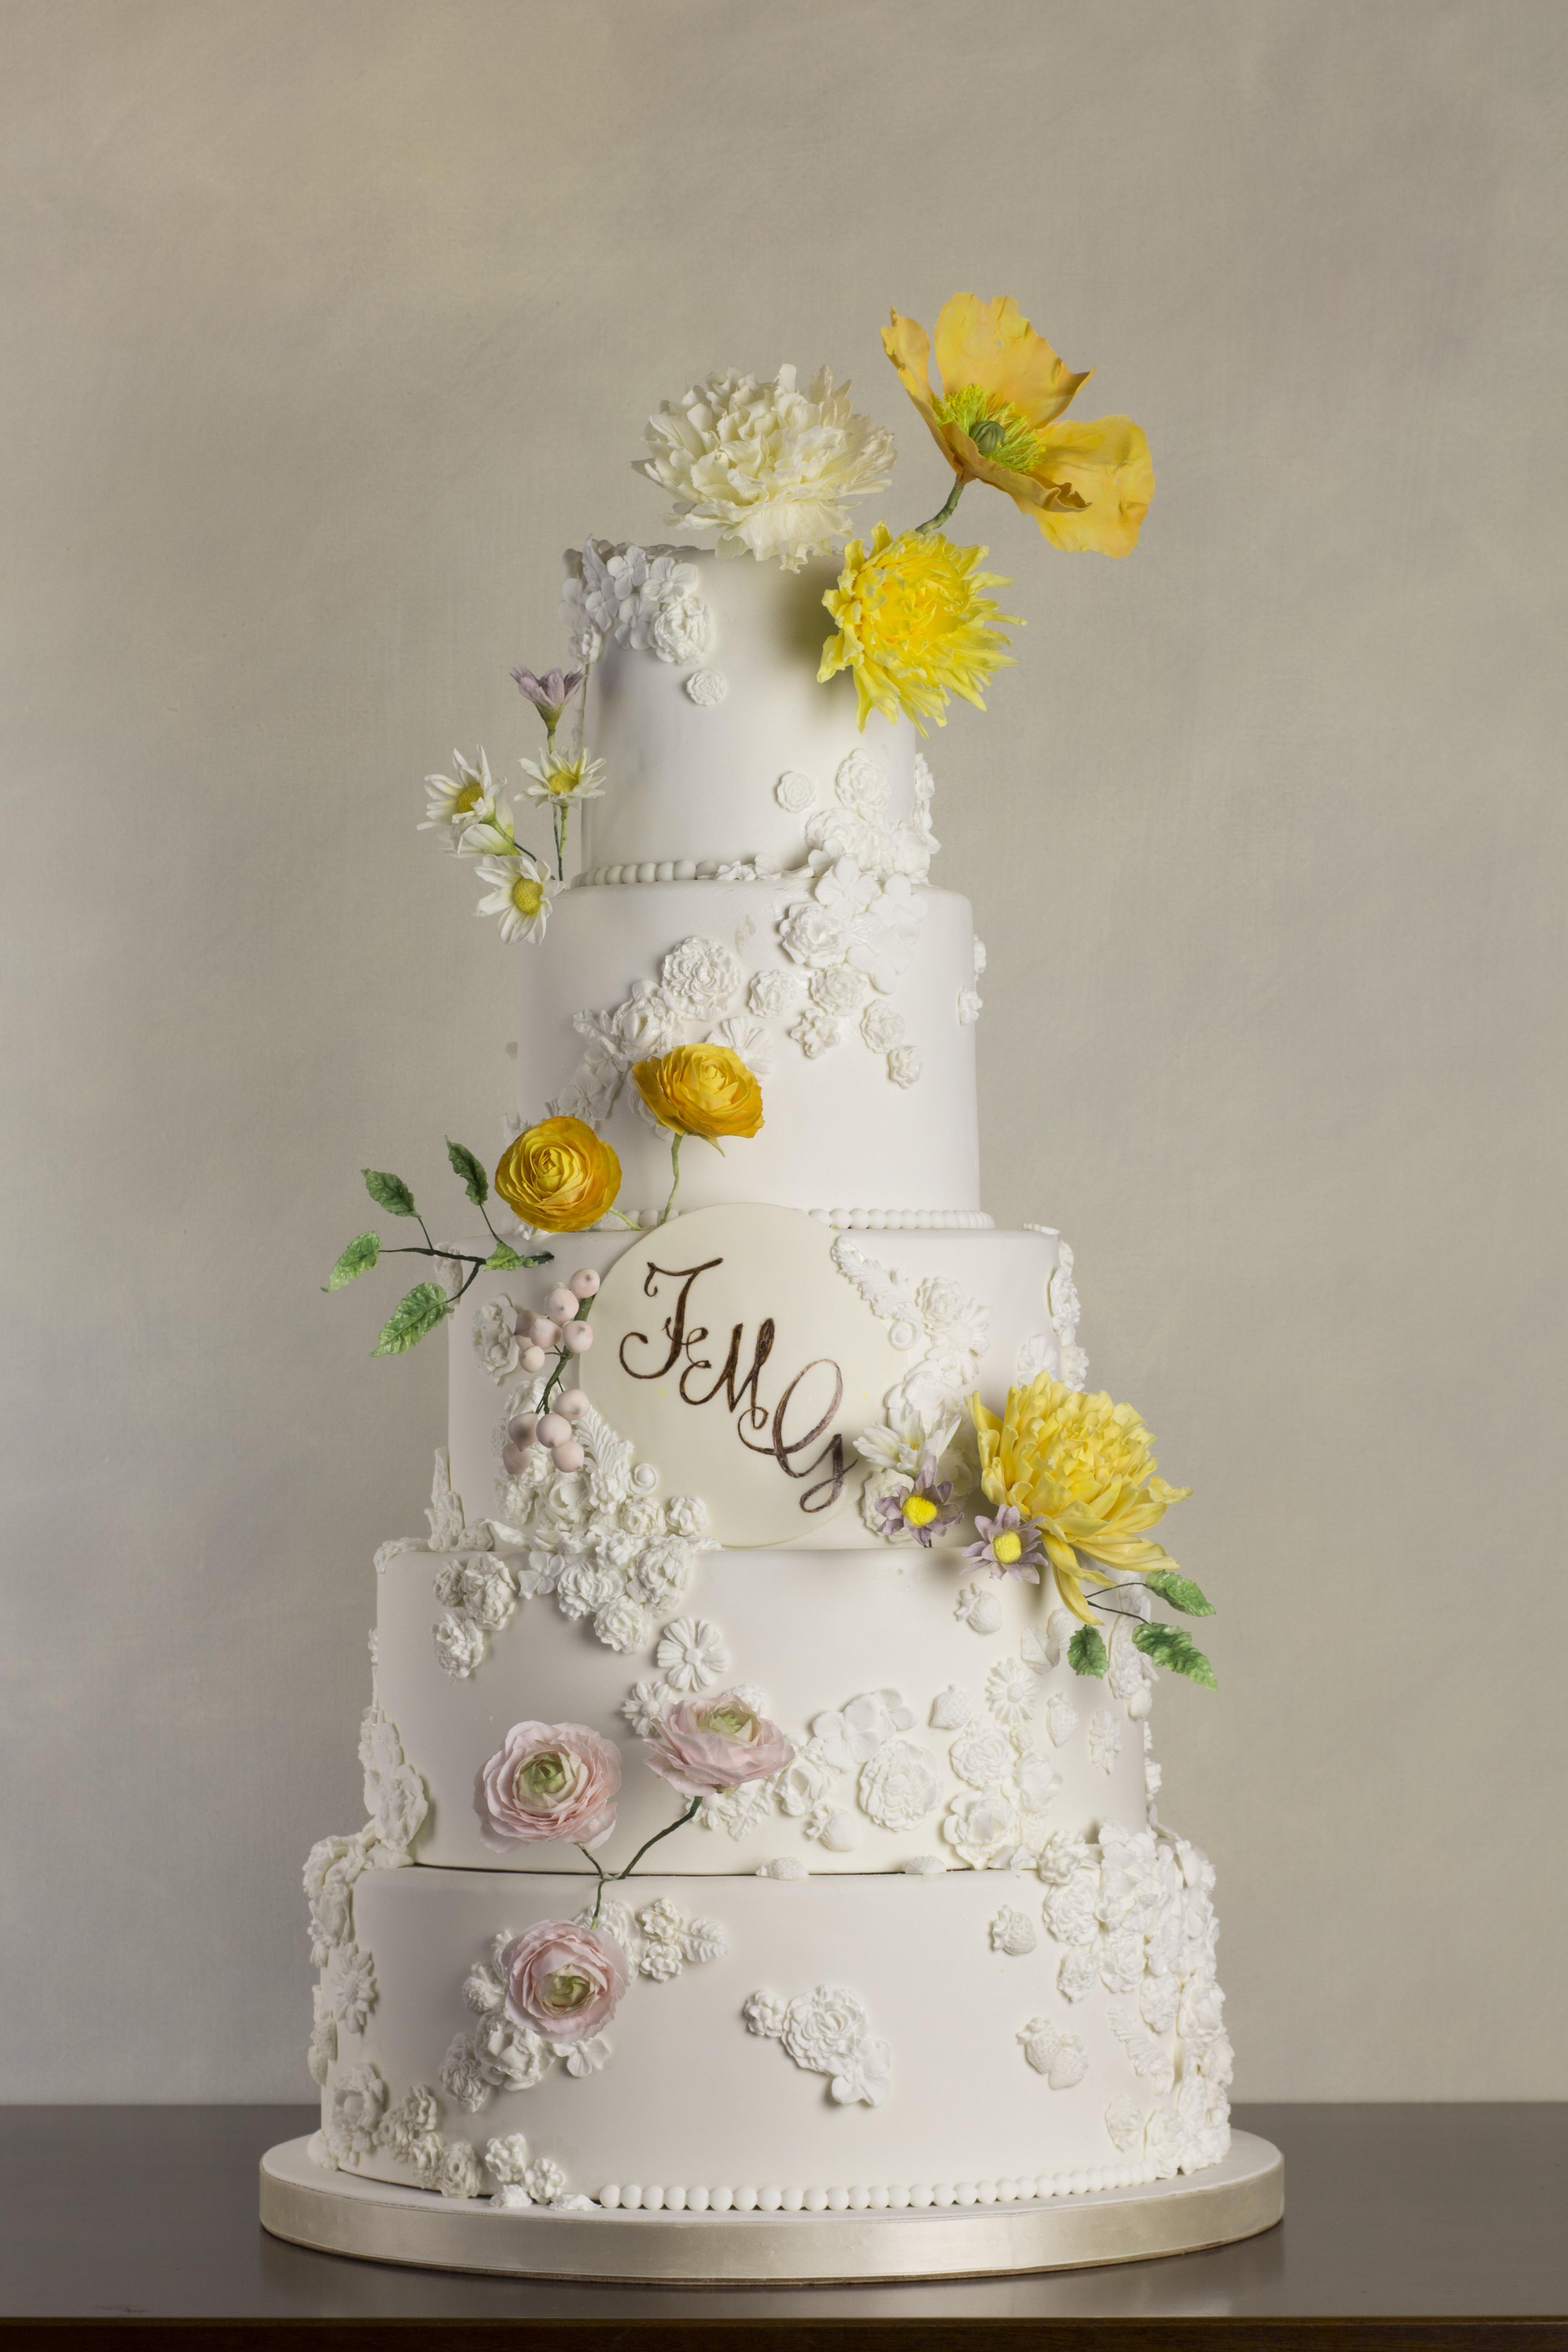 White wedding cake with yellow sugar flowers